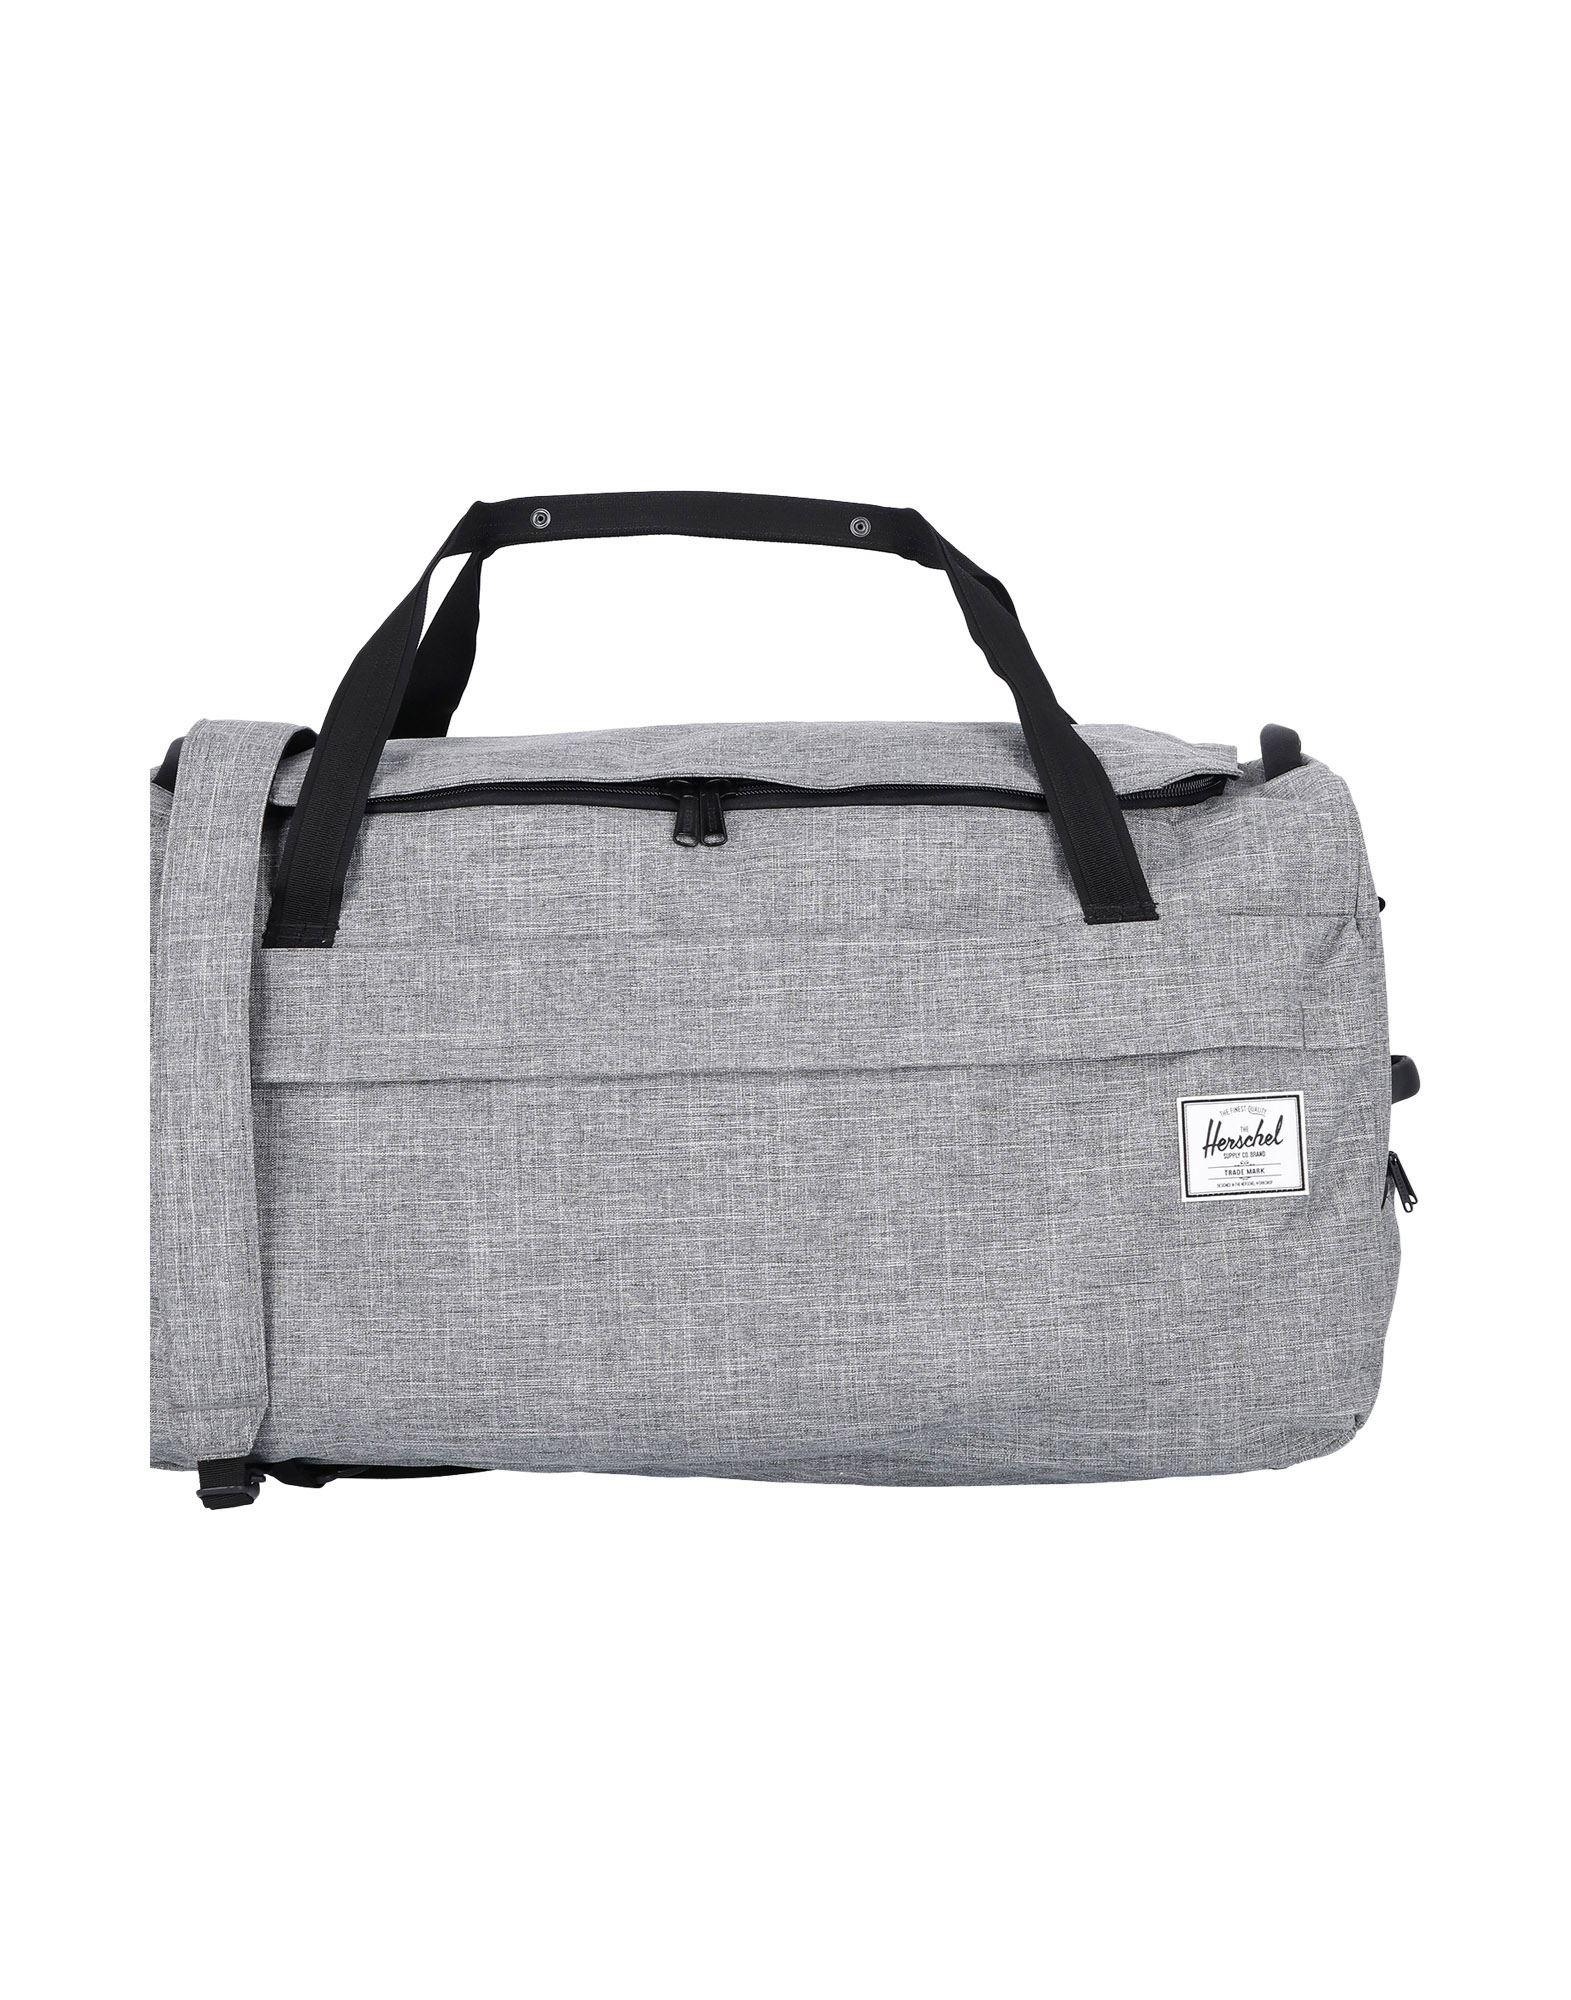 HERSCHEL SUPPLY CO. ハーシェル サプライ メンズ スーツケース グレー